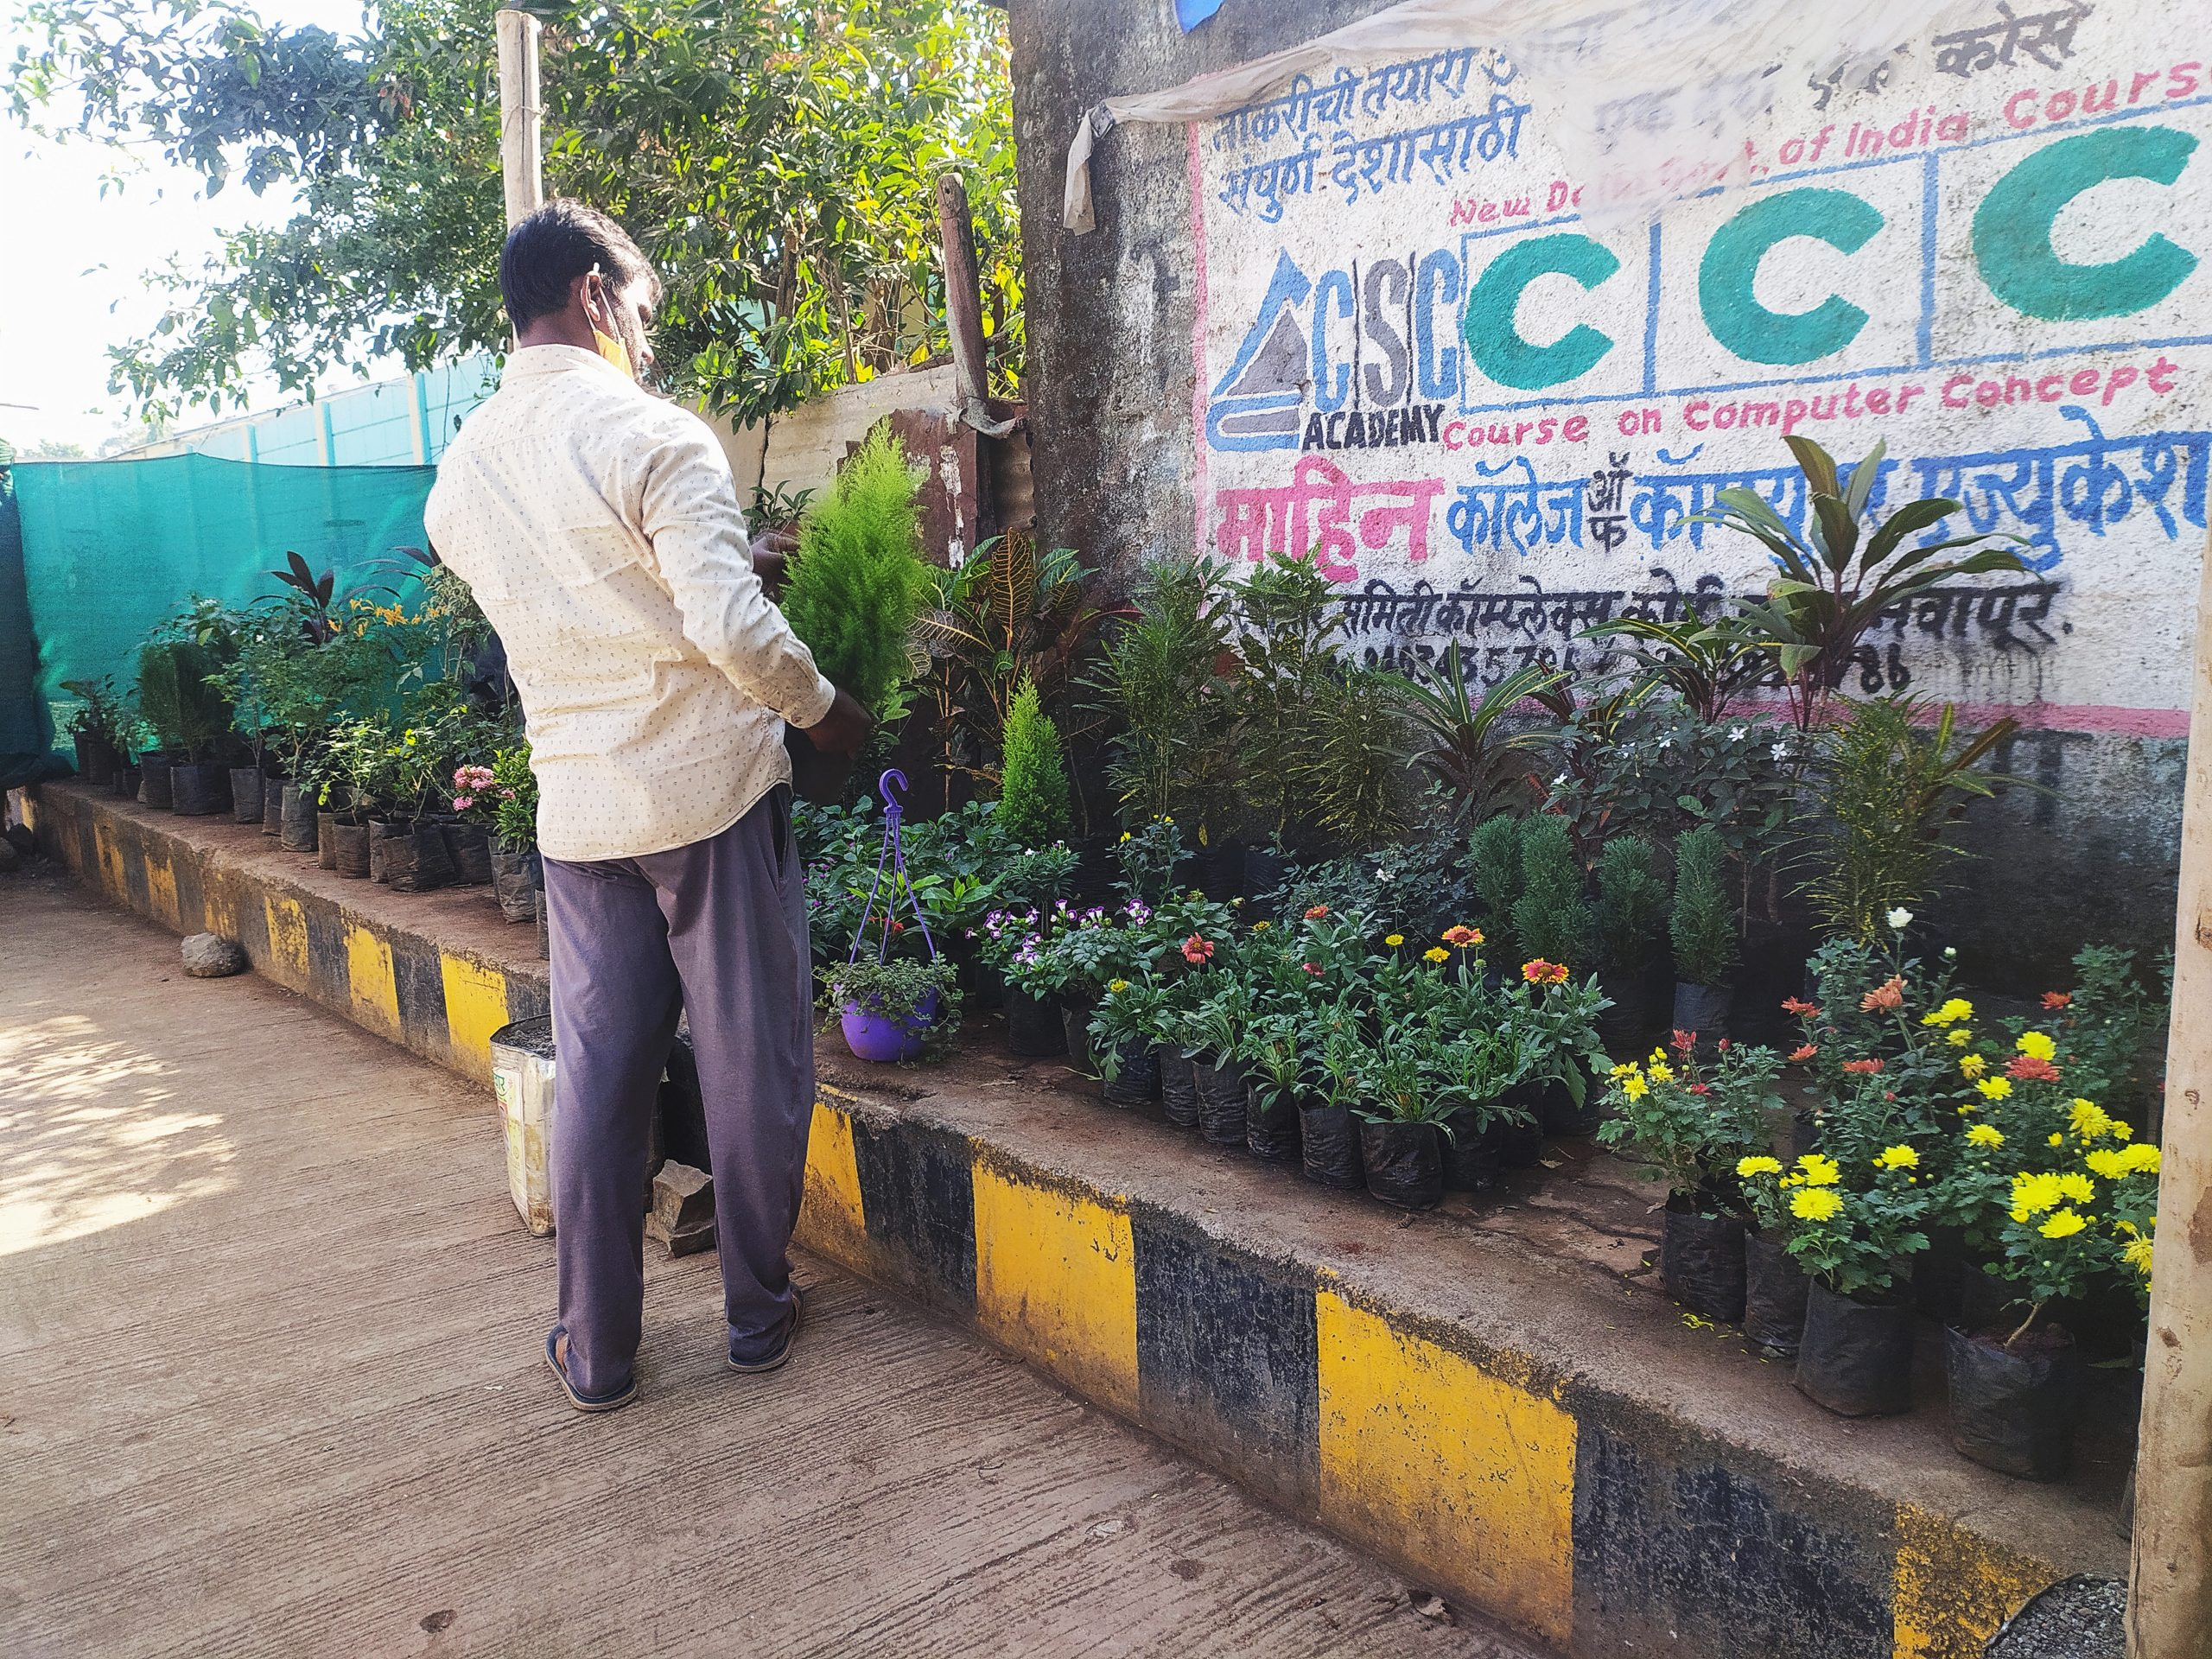 A man selling plants